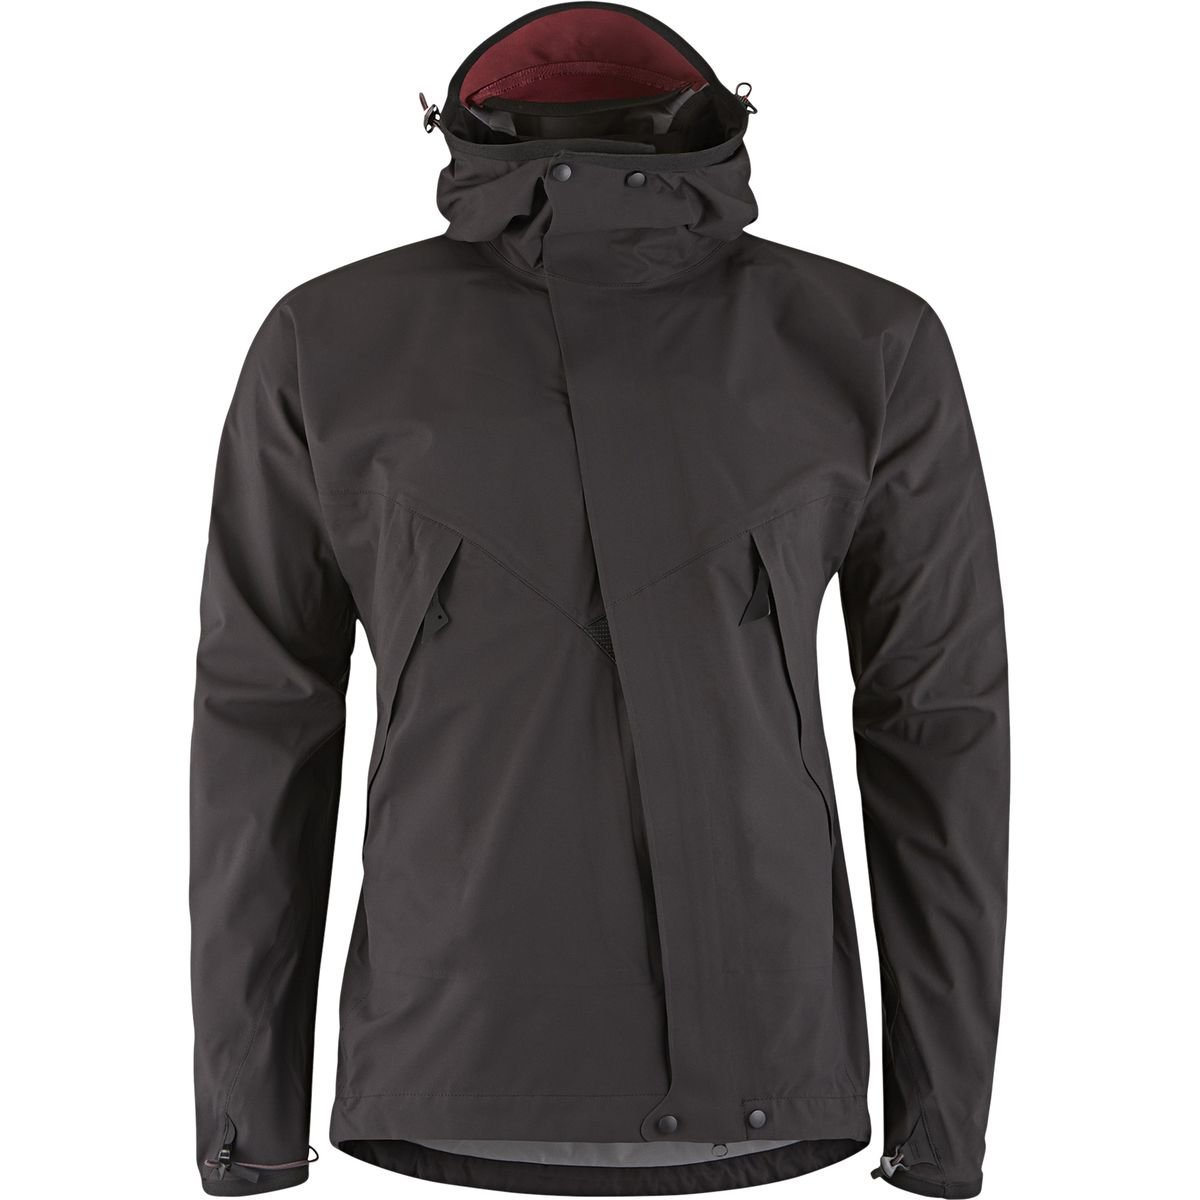 Marmot New Blue Ridge Fleece Jacket #8768 Mens Medium Black//Lava